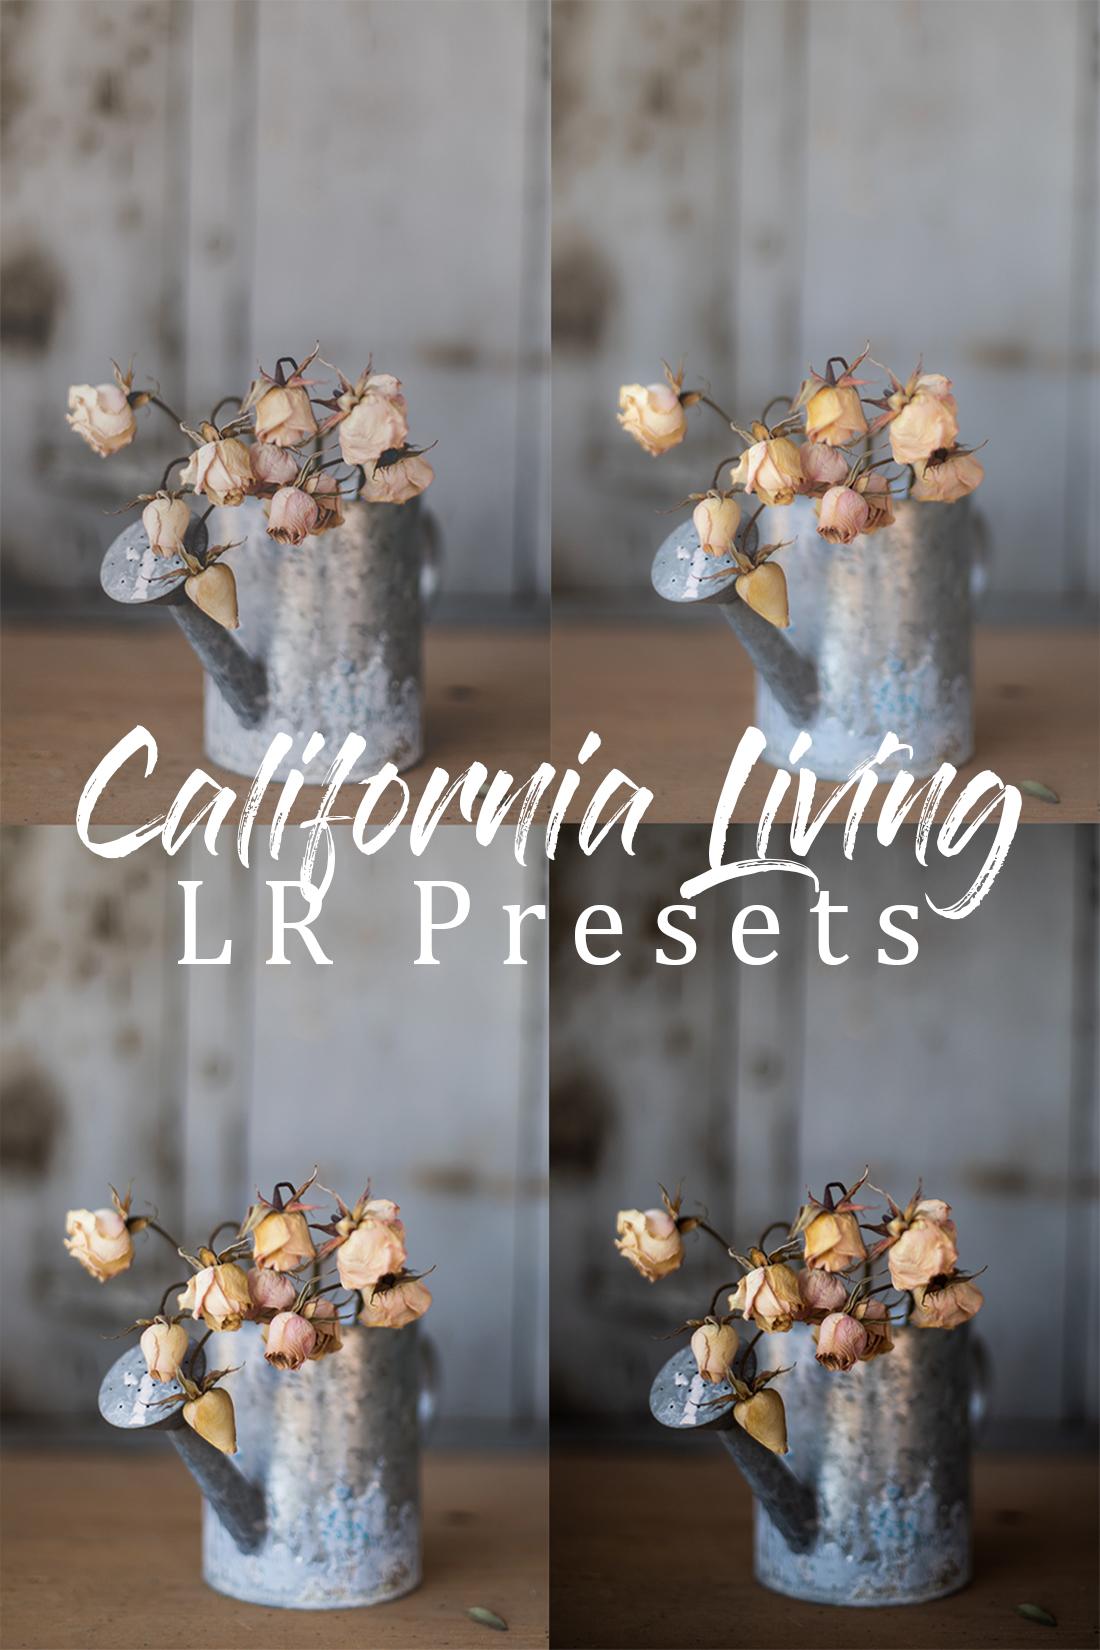 California Living LR Presets